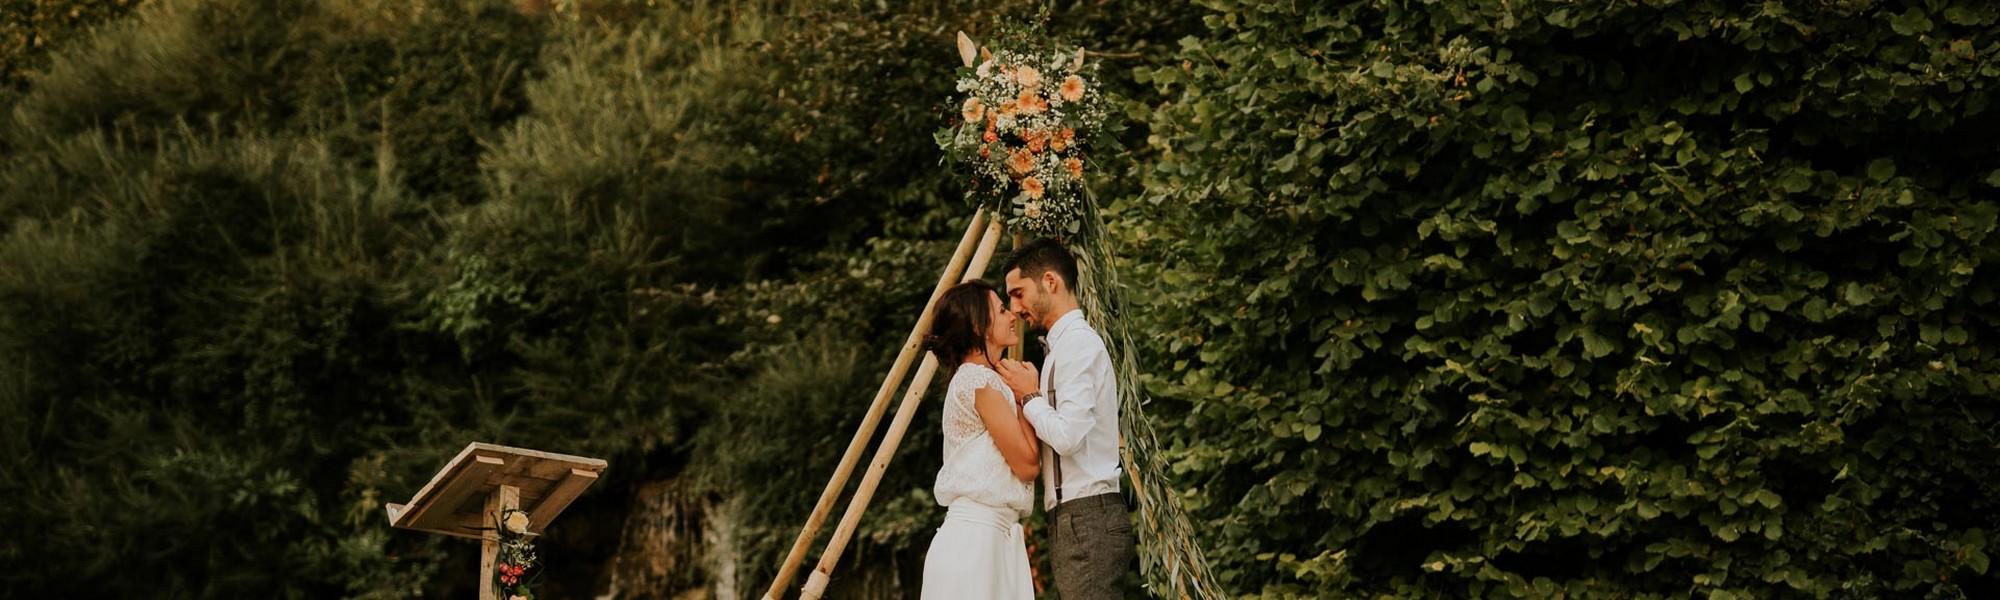 organisatrice de mariage lens lille